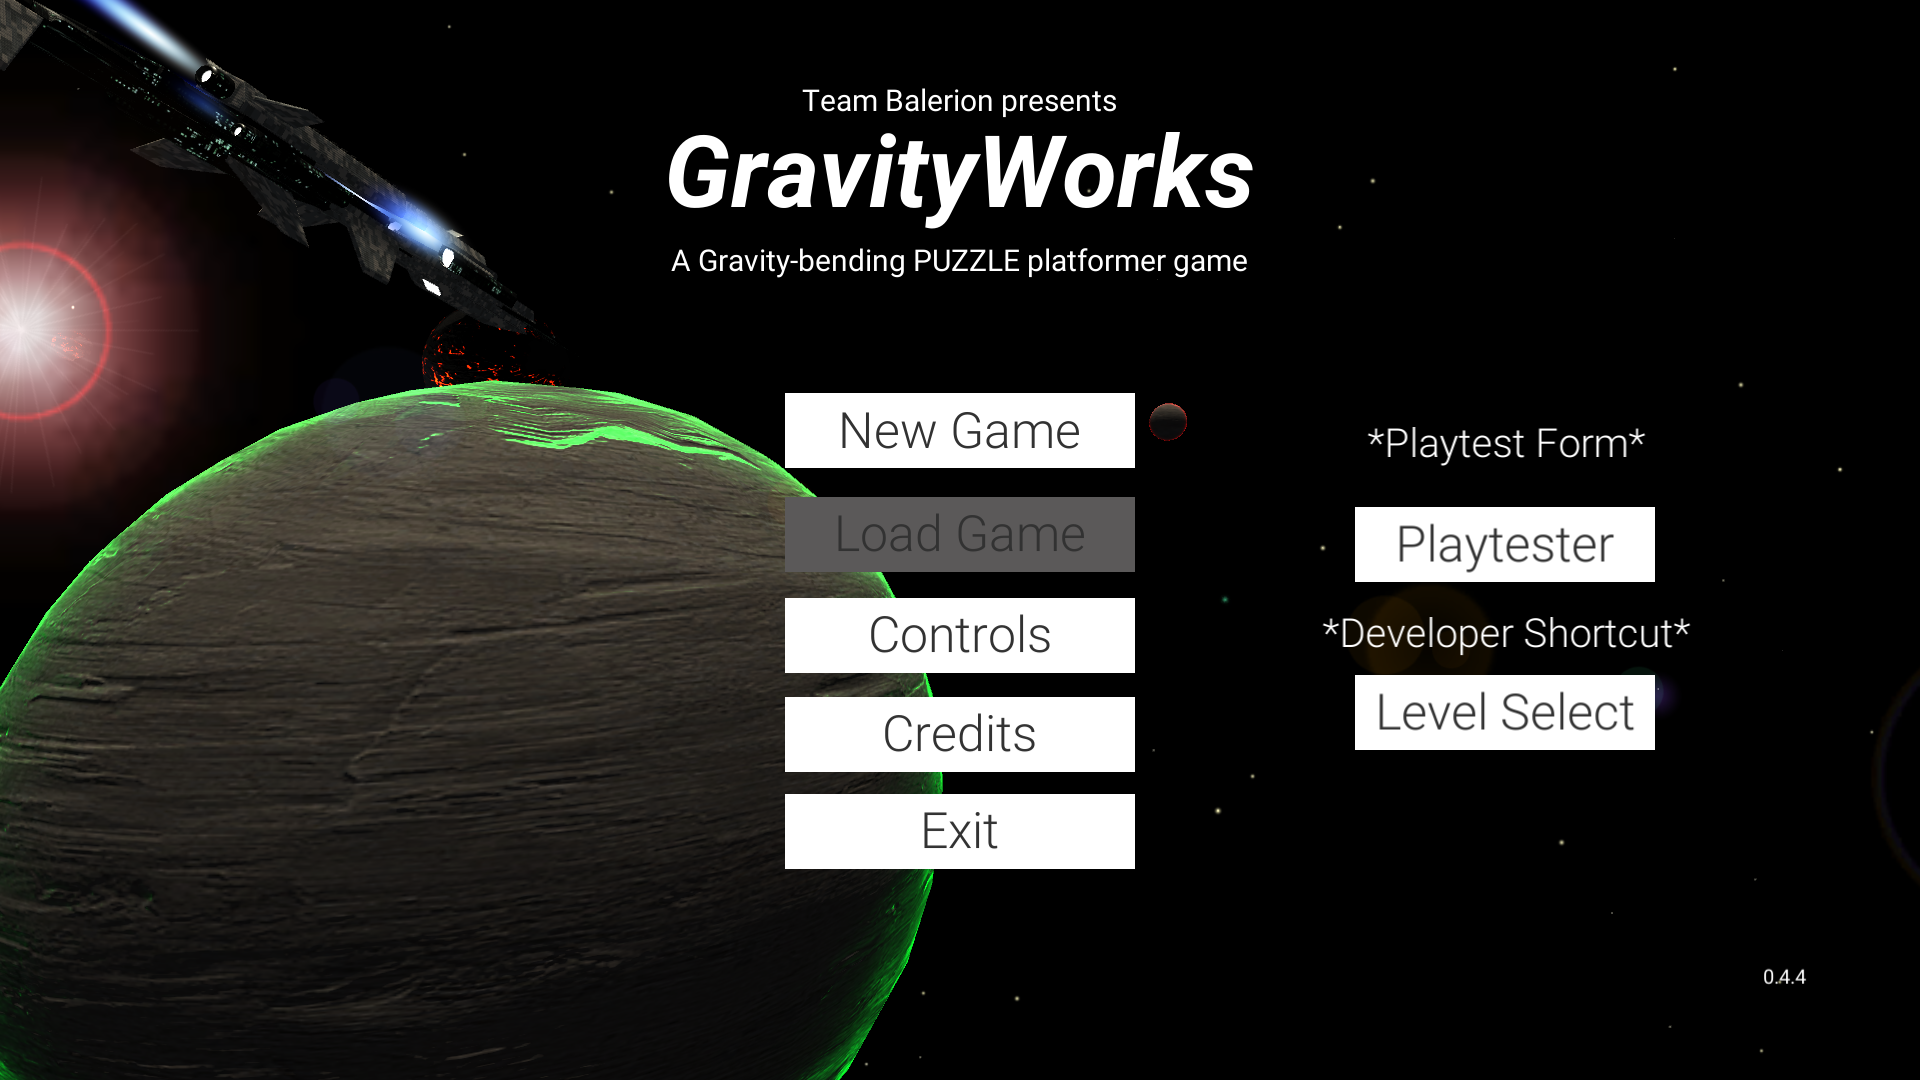 GravityWorks